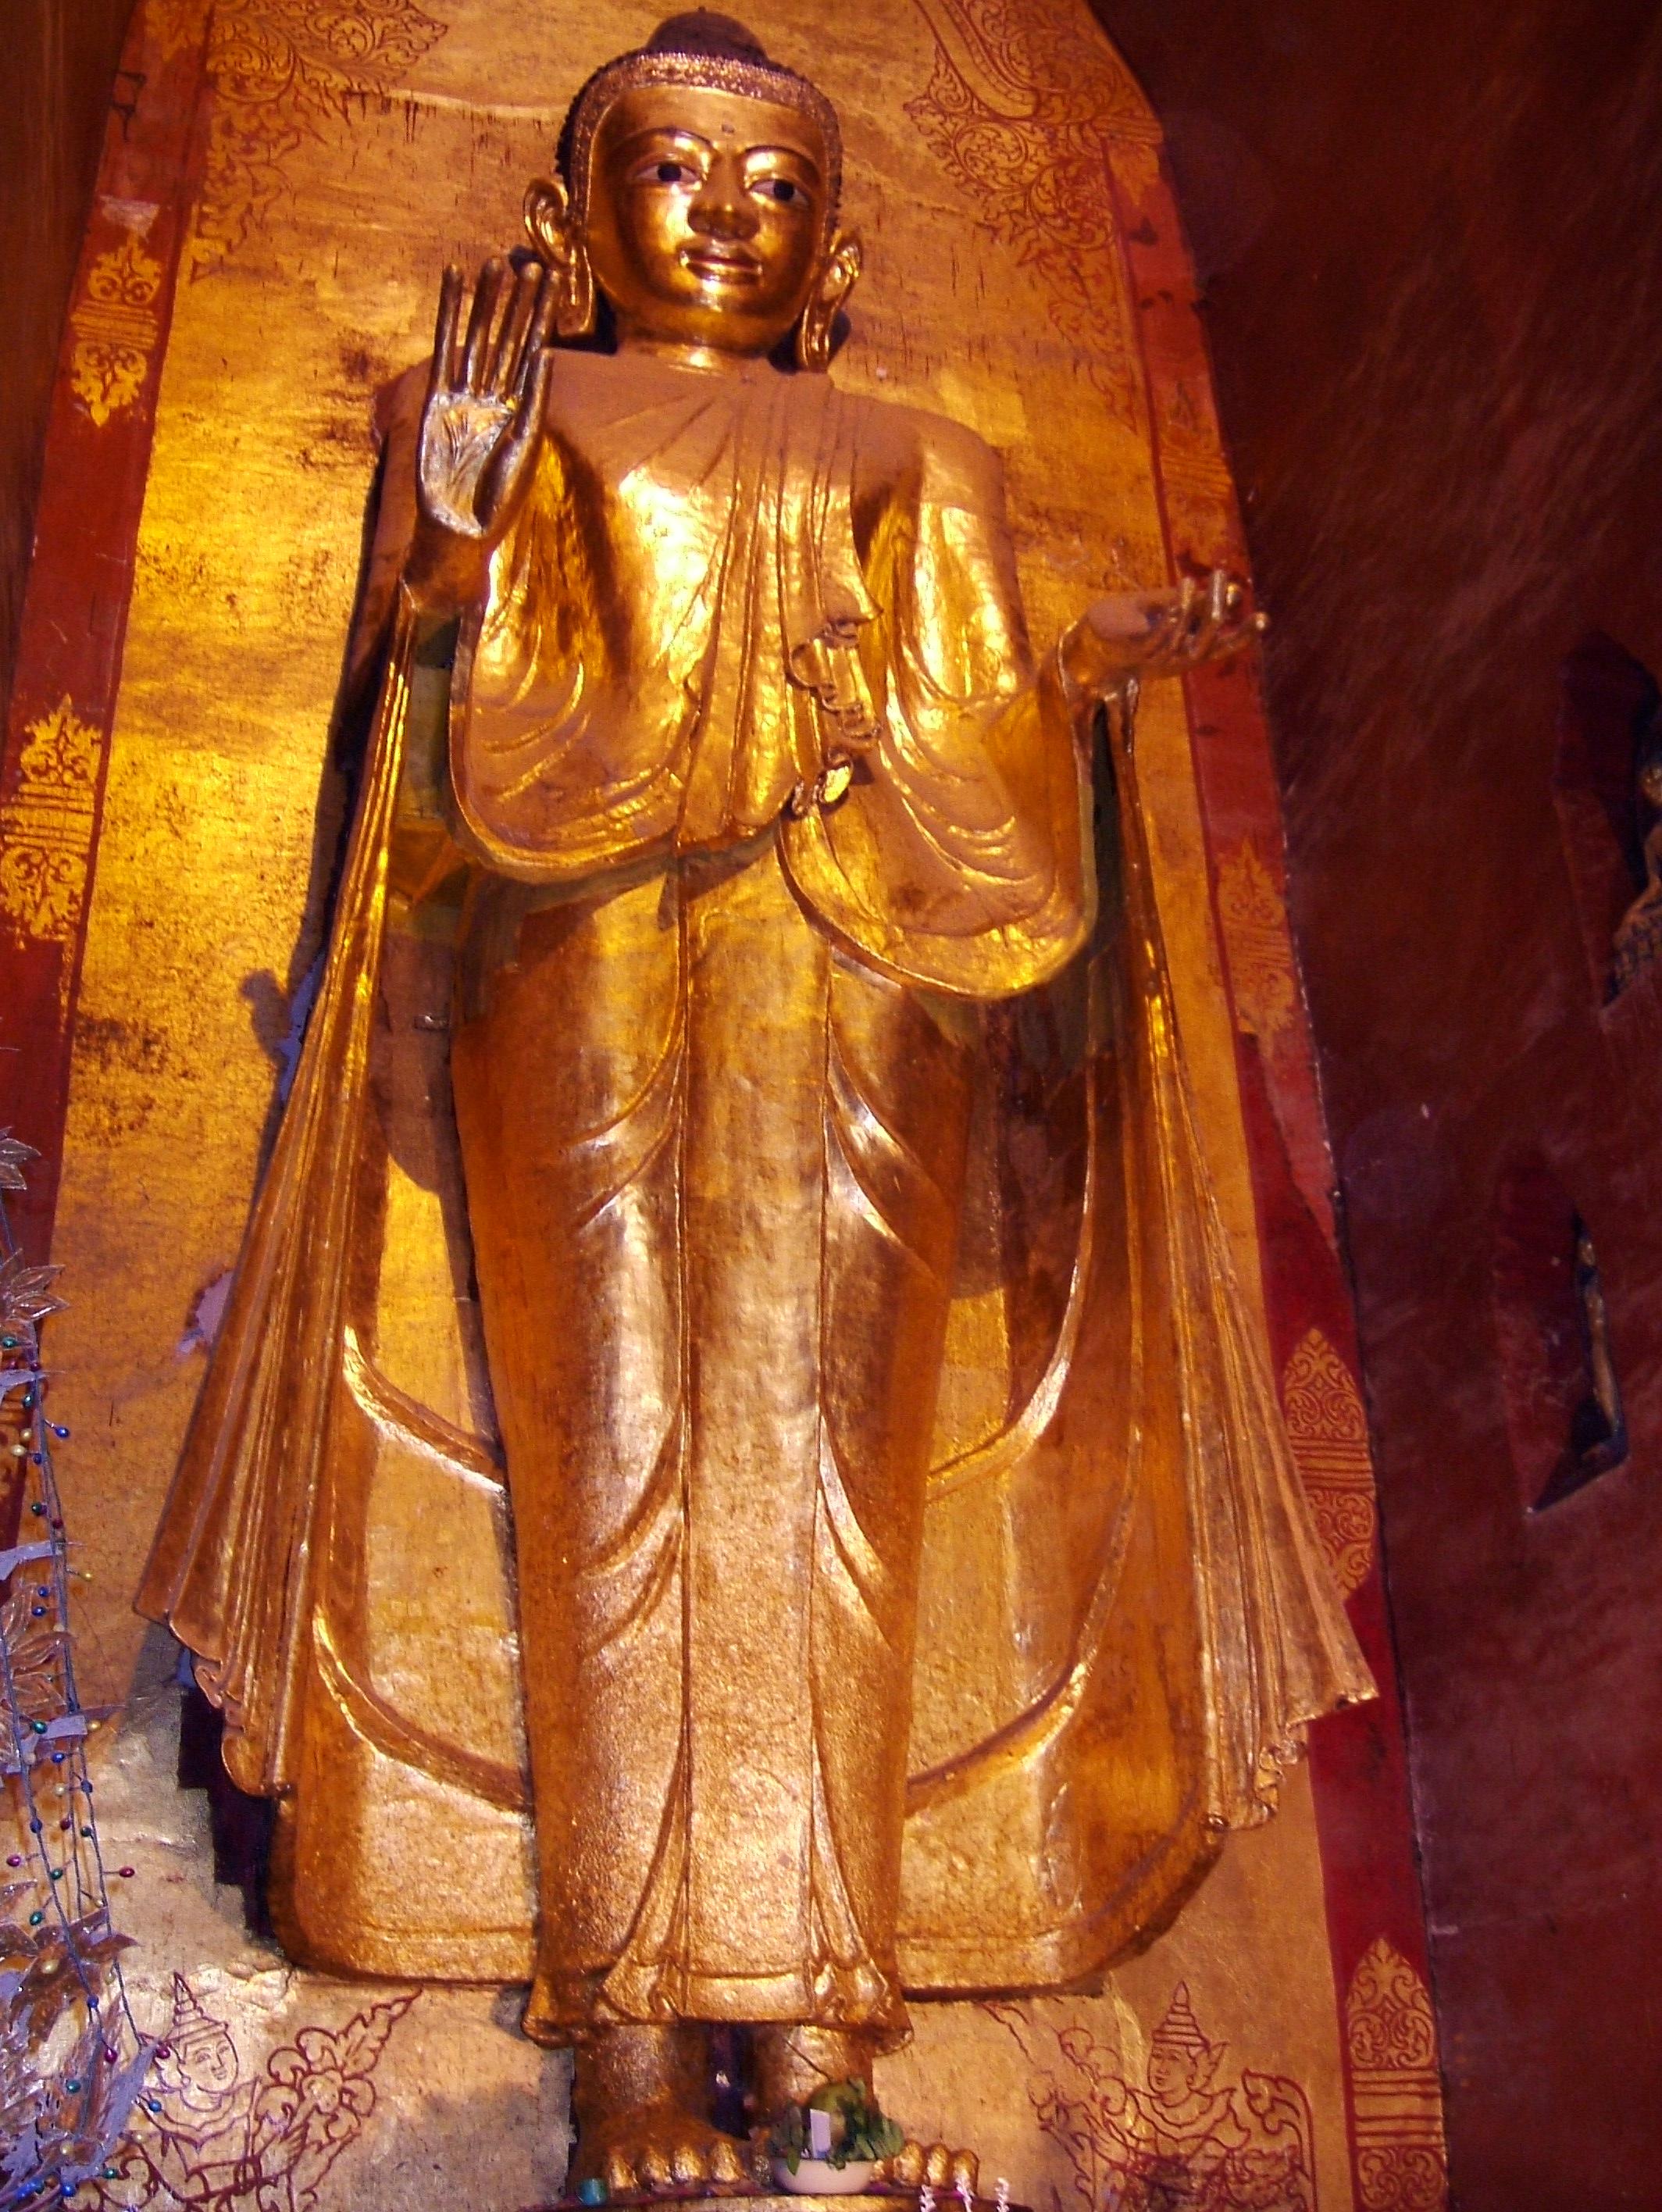 Ananda Pagoda standing Buddhas Pagan Dec 2000 09